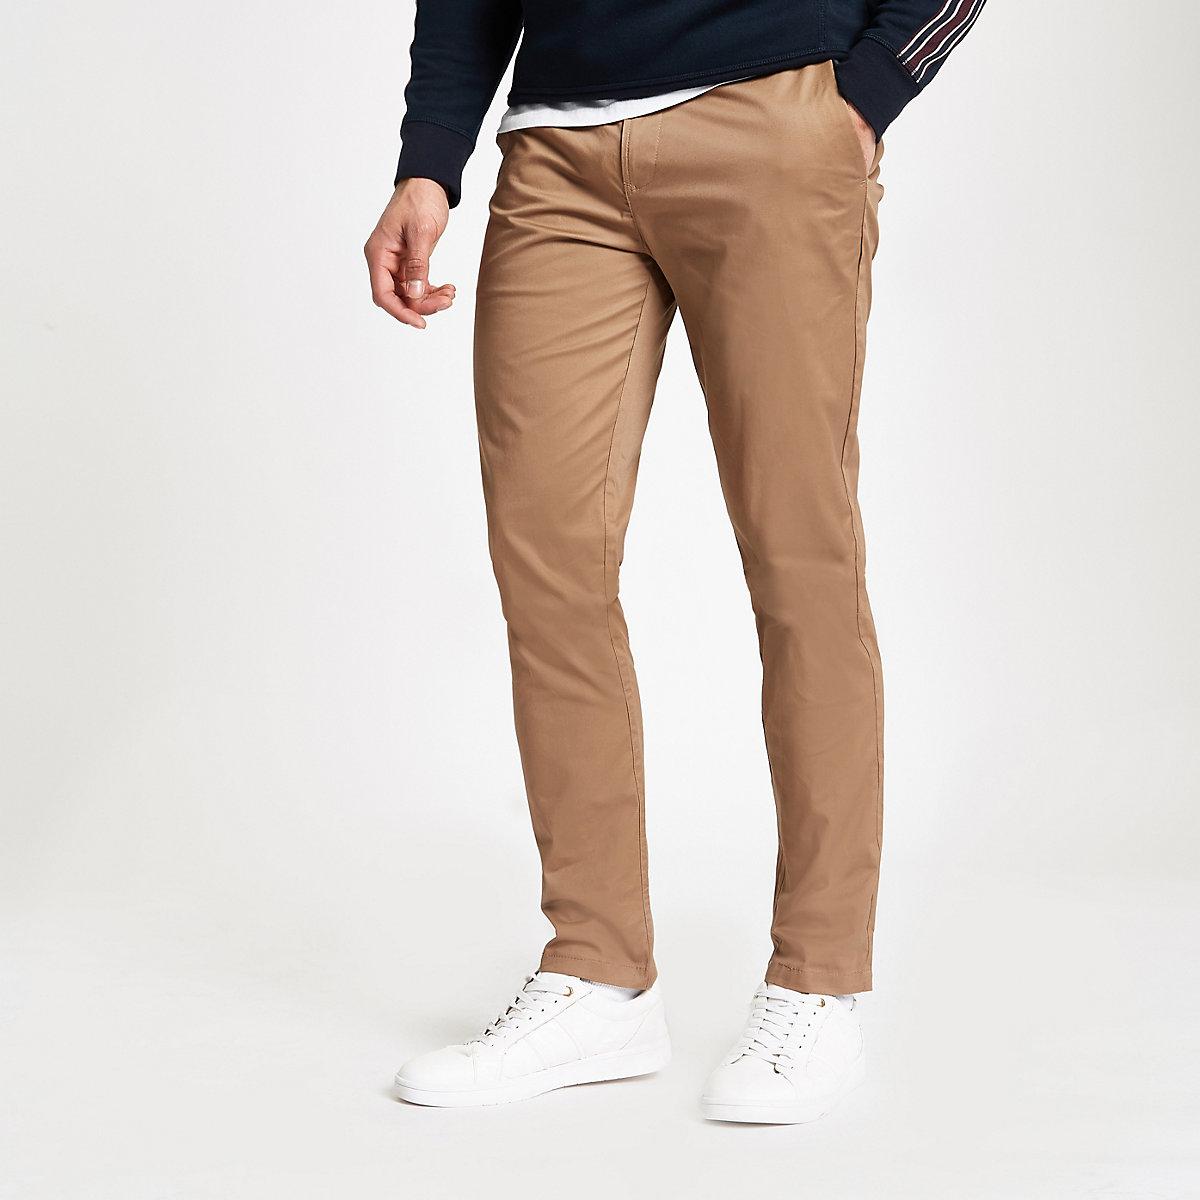 Tan slim fit chino pants